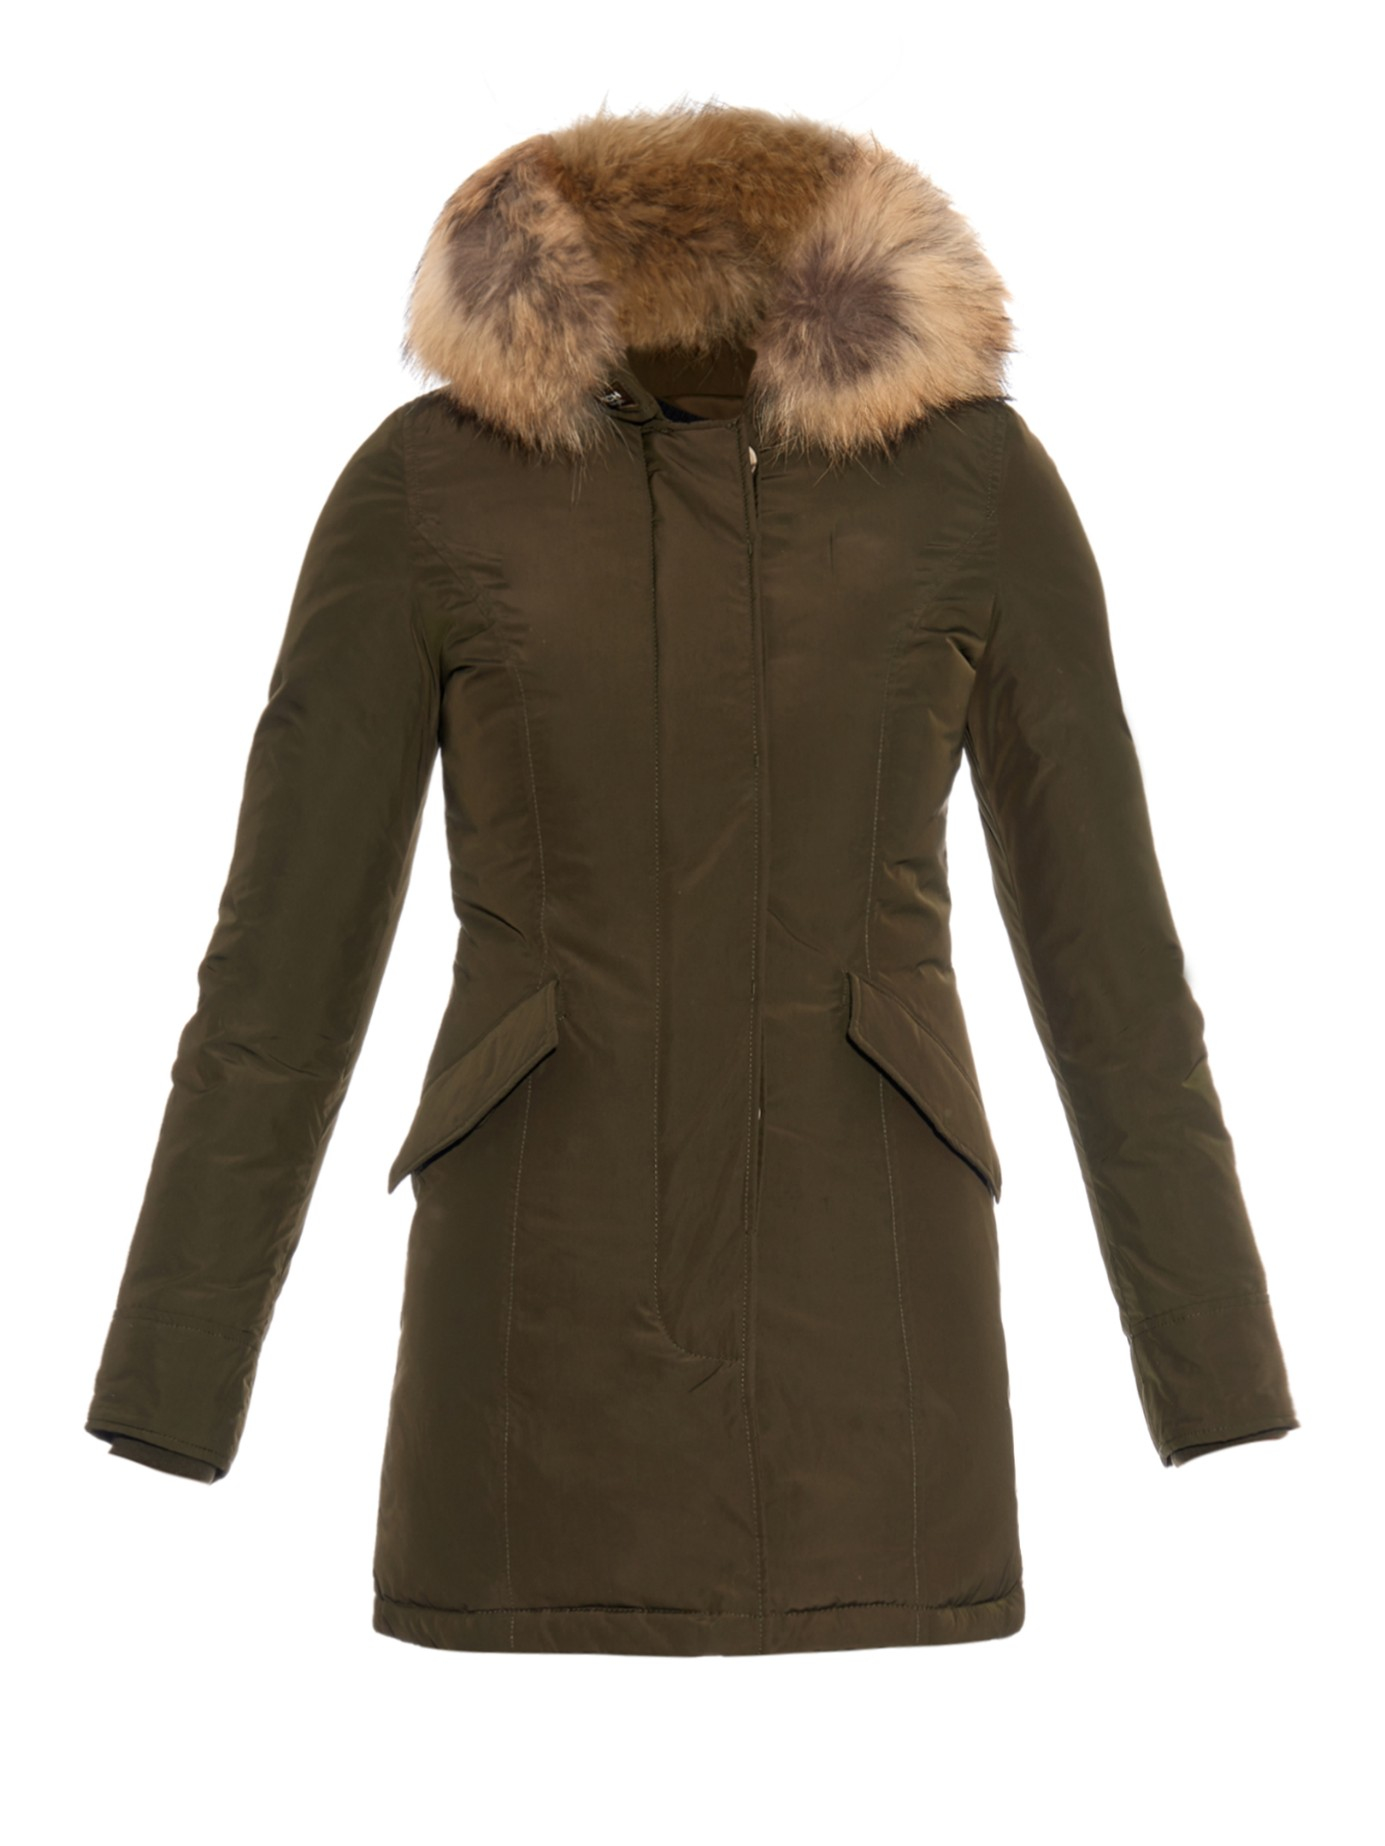 woolrich luxury arctic raccoon fur trimmed parka in. Black Bedroom Furniture Sets. Home Design Ideas